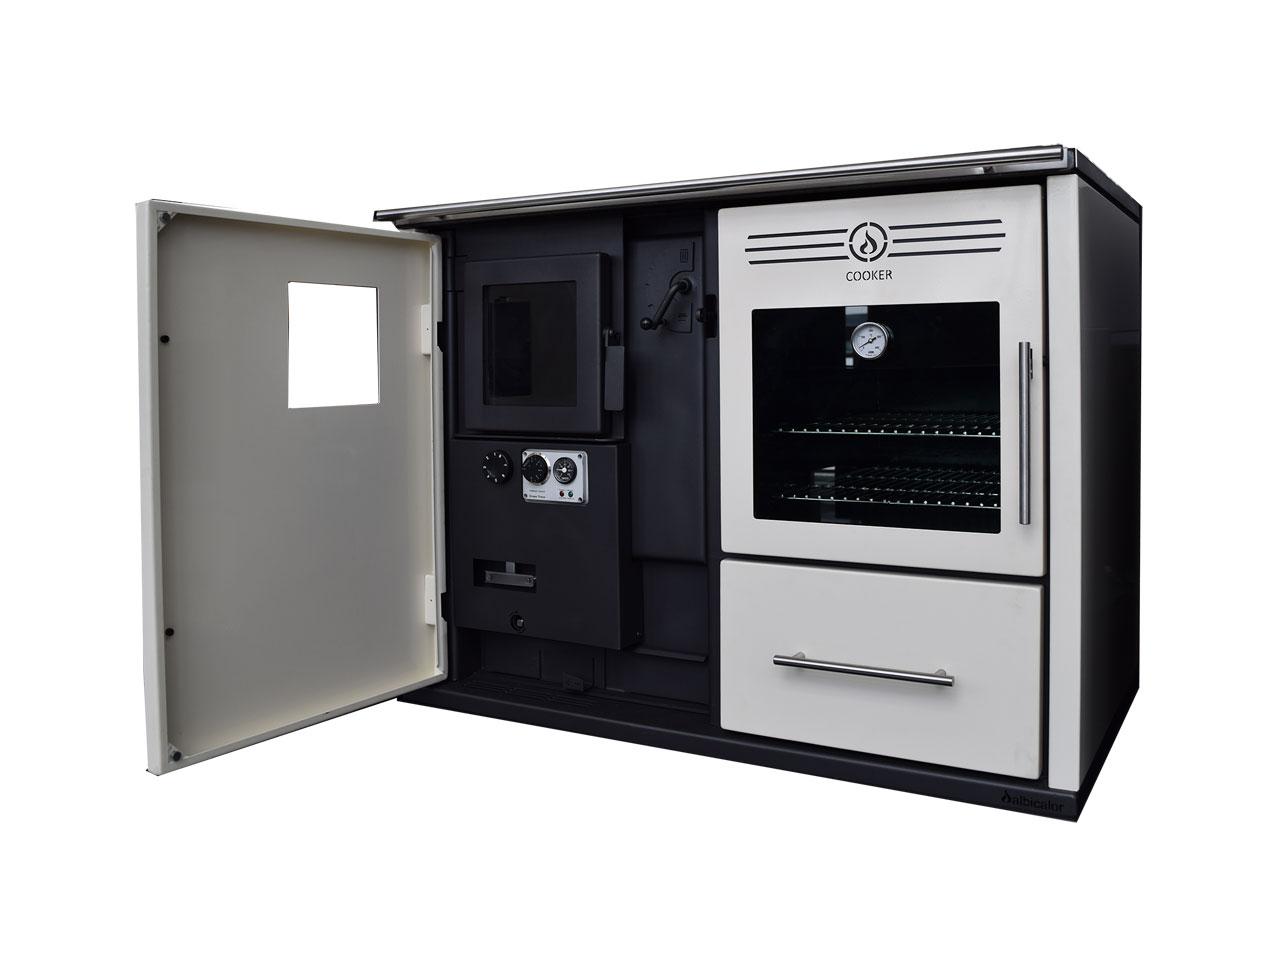 Cocina calefactora de le a efilume for Cocinas calefactoras de lena precios